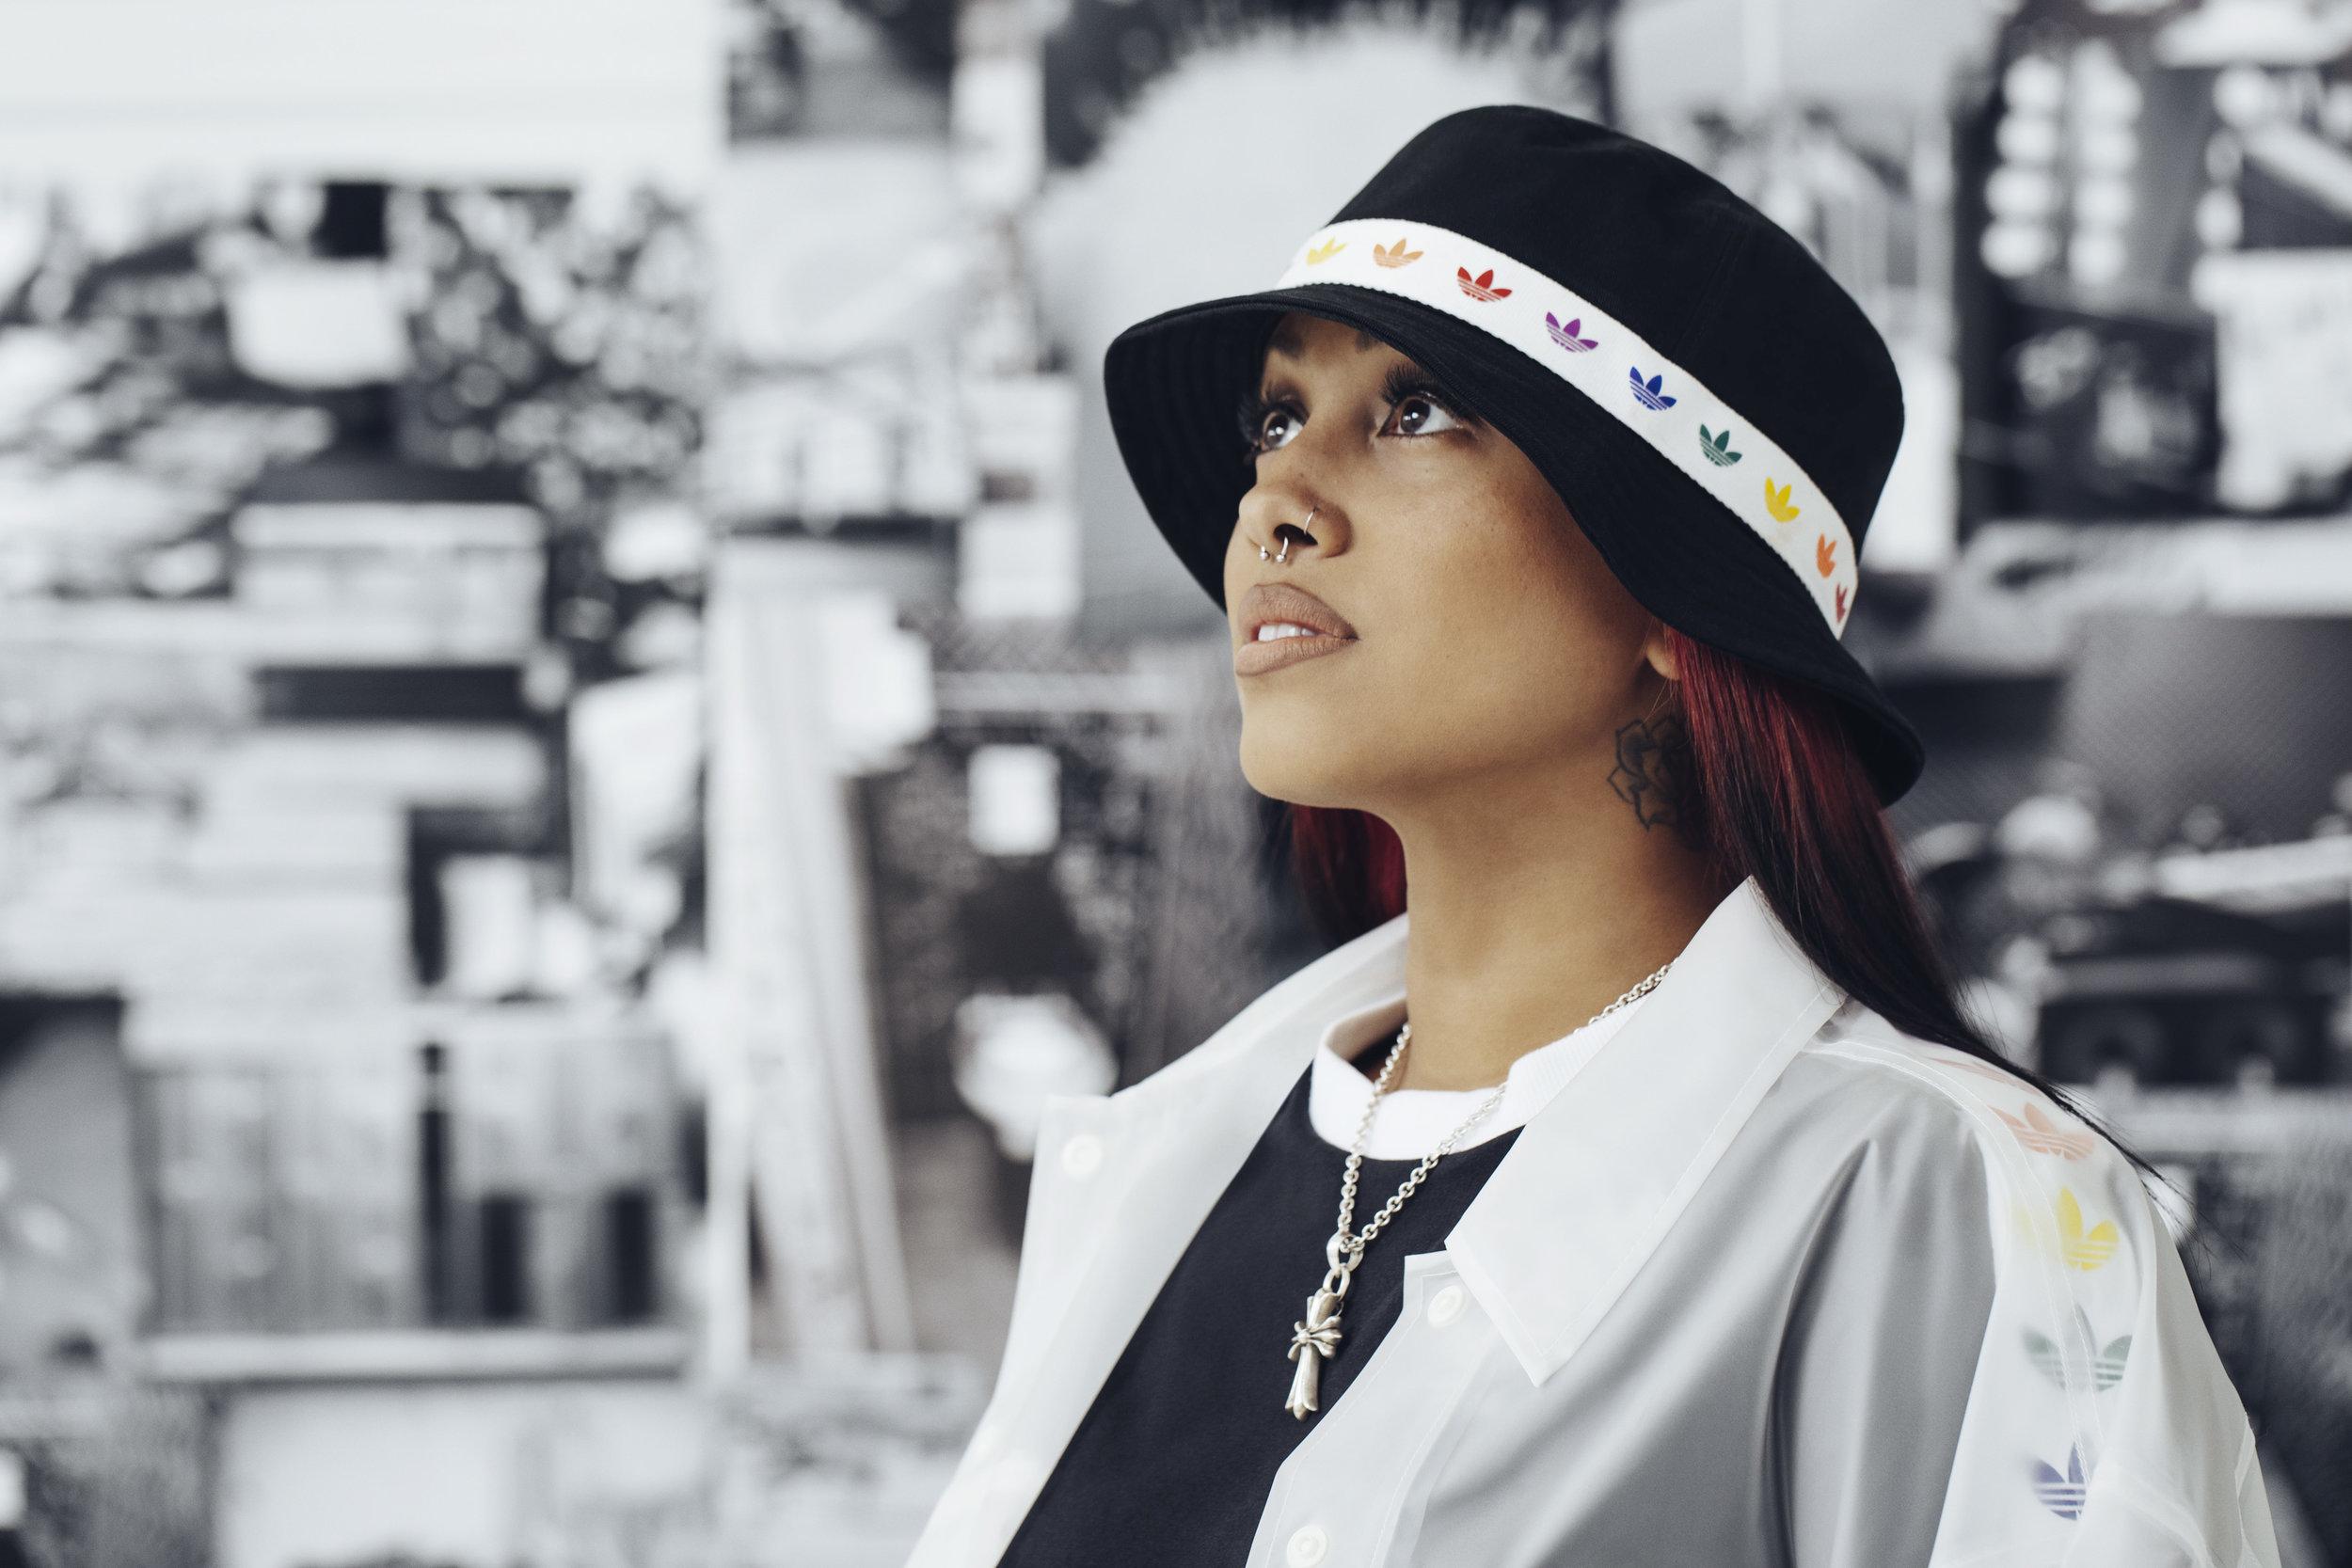 adidas_pride_love_unites_by_gia_goodrich_lesbian_artist_activist_Shot_16_Venus_Lk_01_01368.jpg